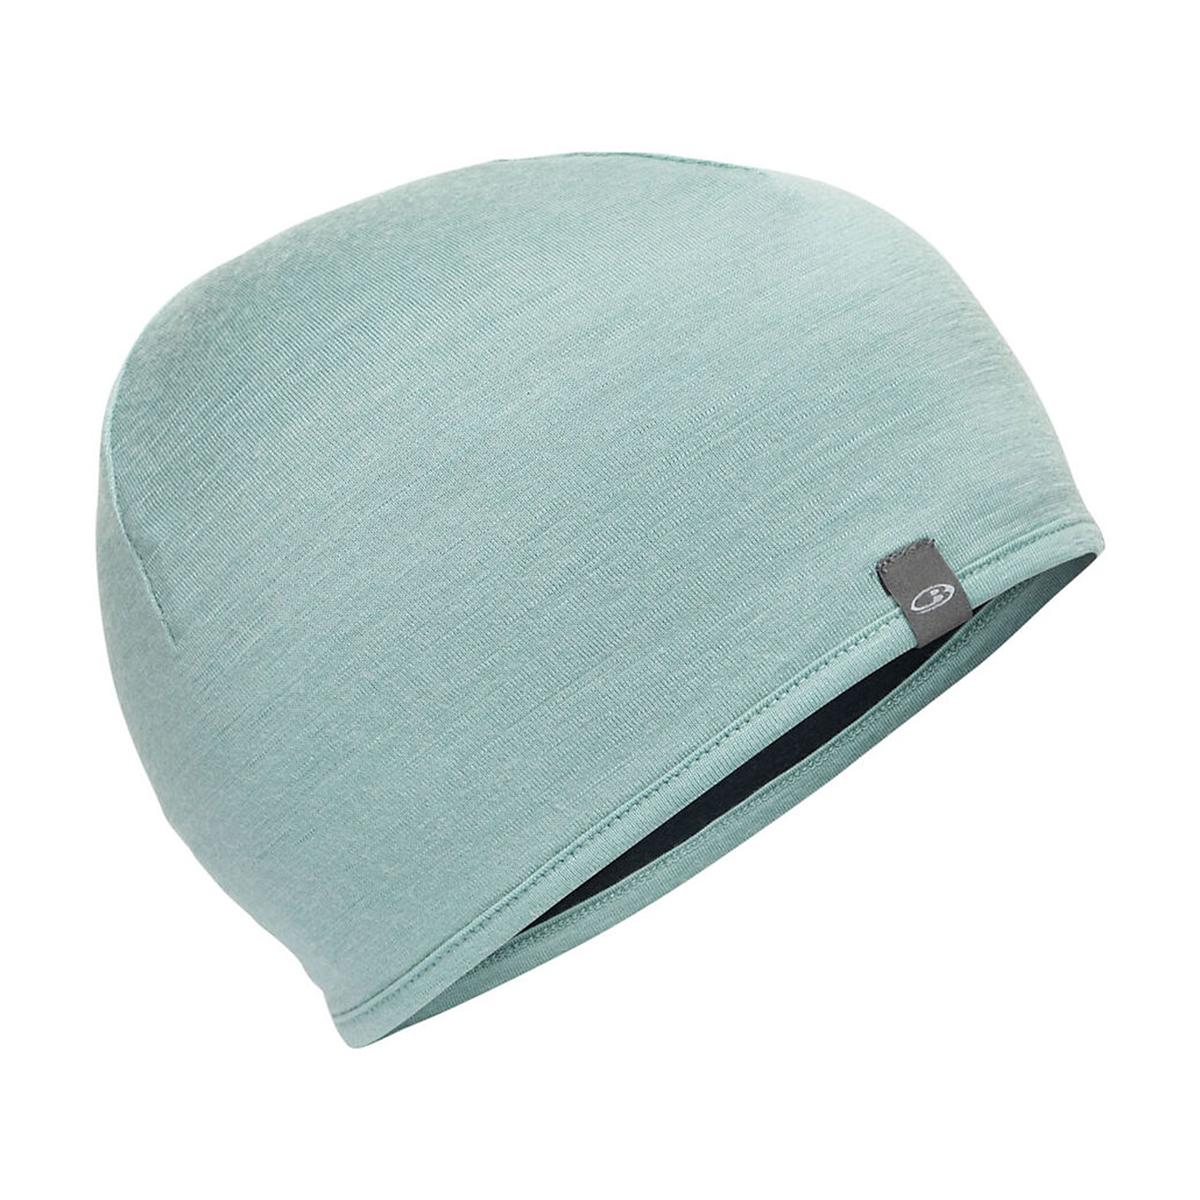 Icebreaker Pocket Hat - Color: Hydro/Nightfall, Hydro/Nightfall, large, image 1